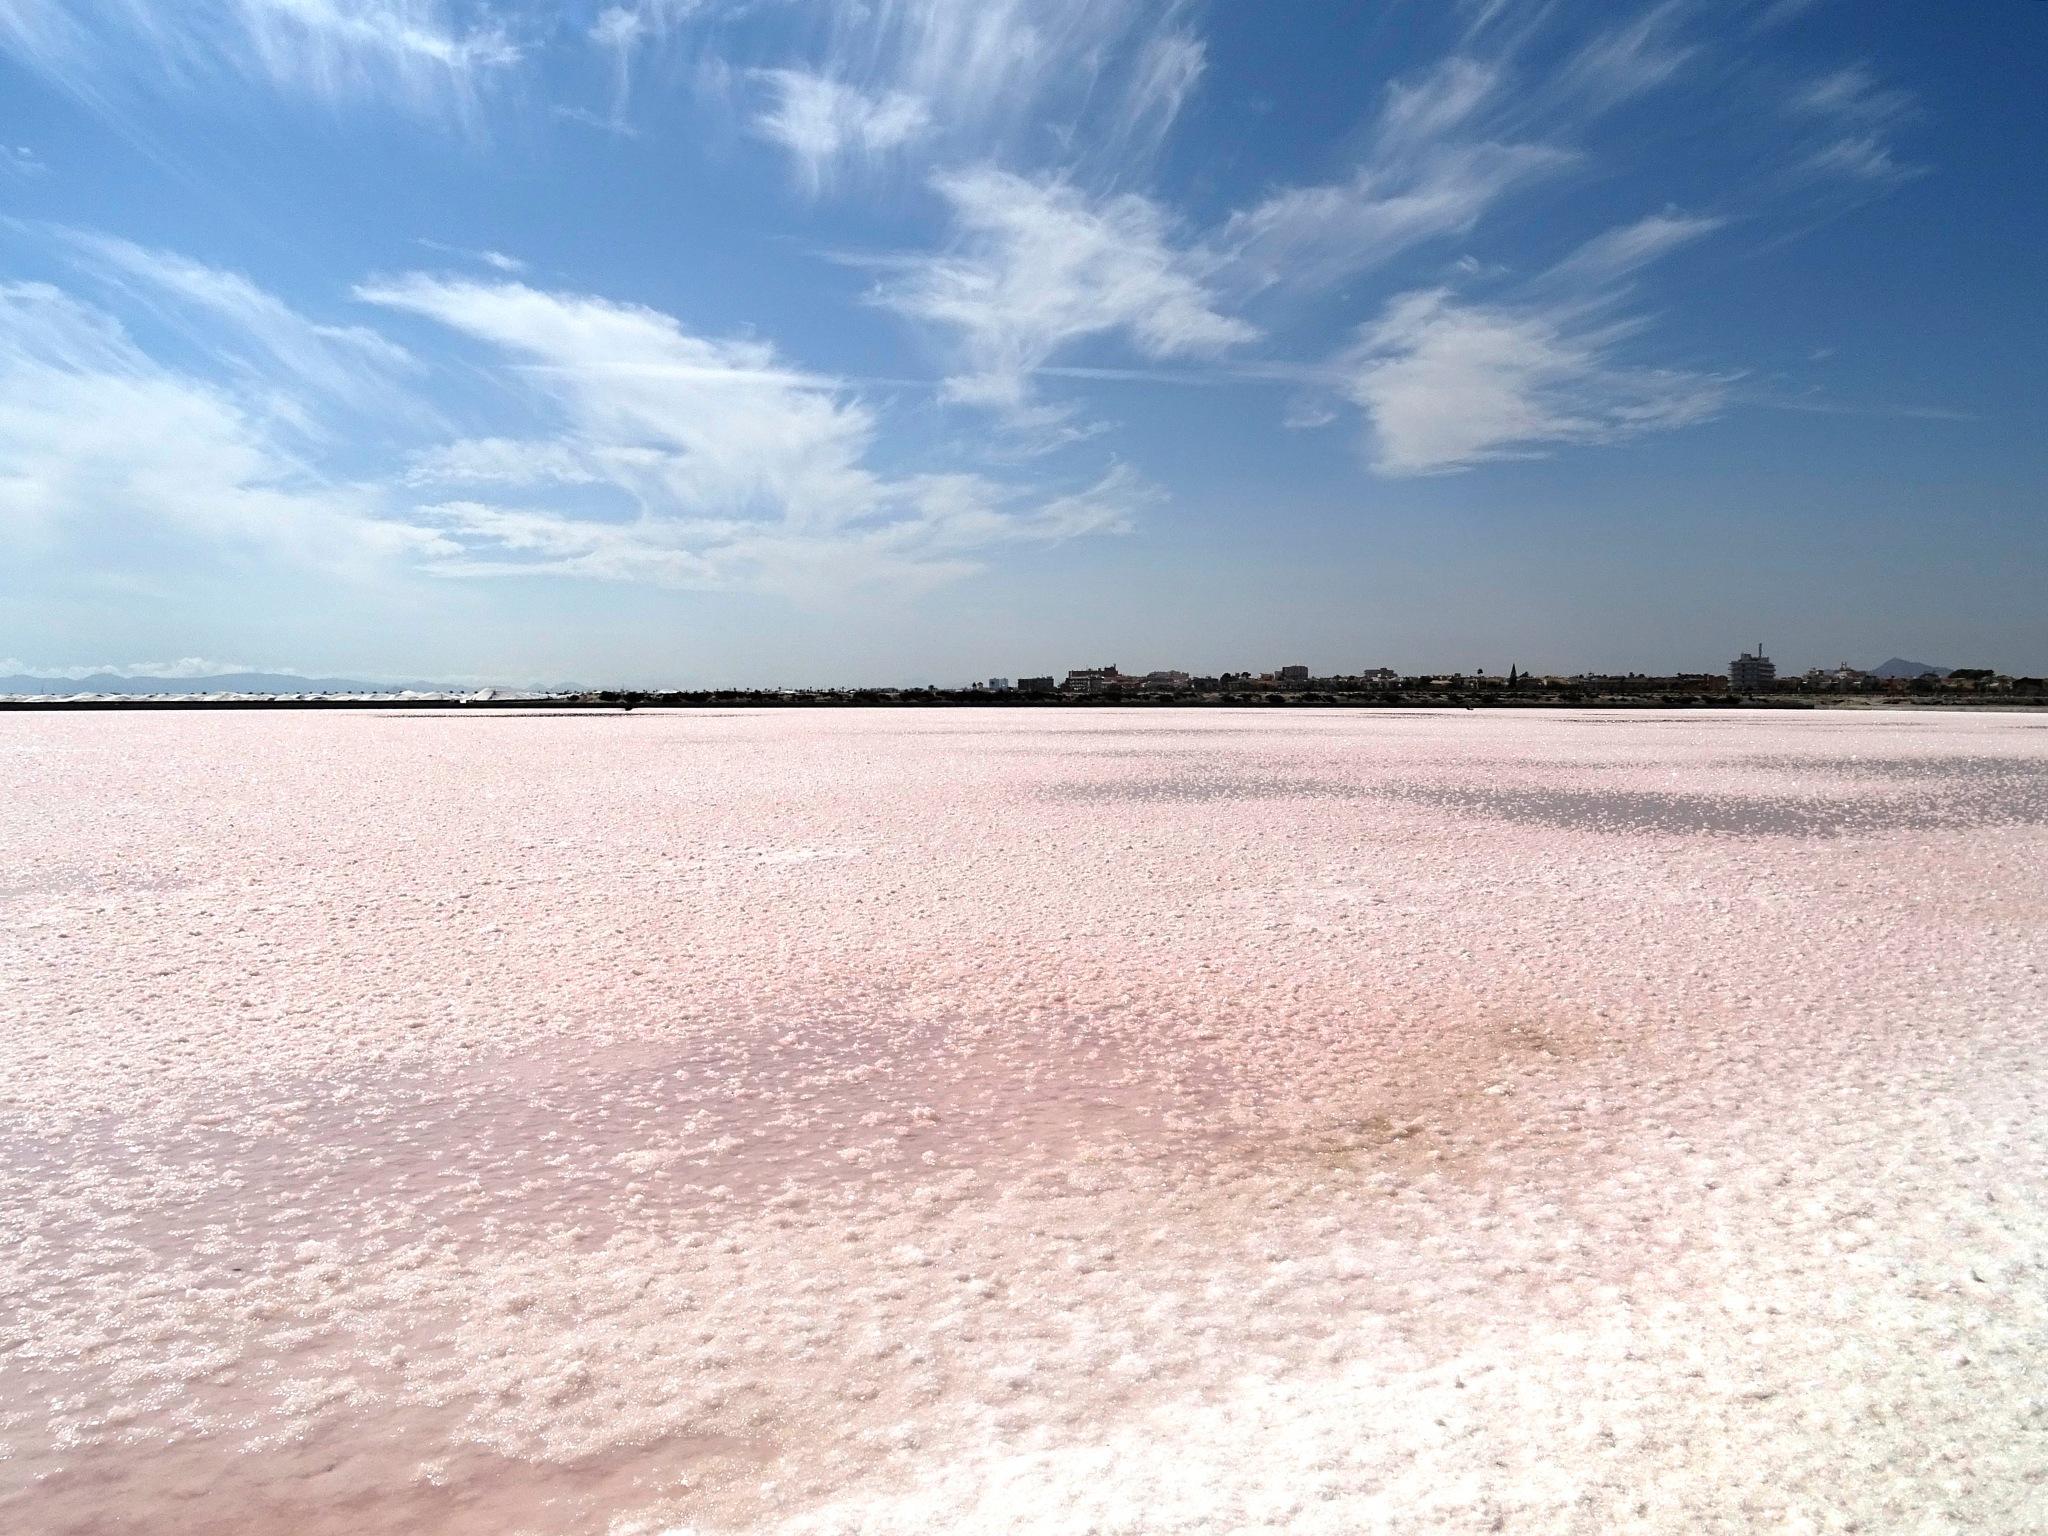 mar de sal by lola.garciaayala